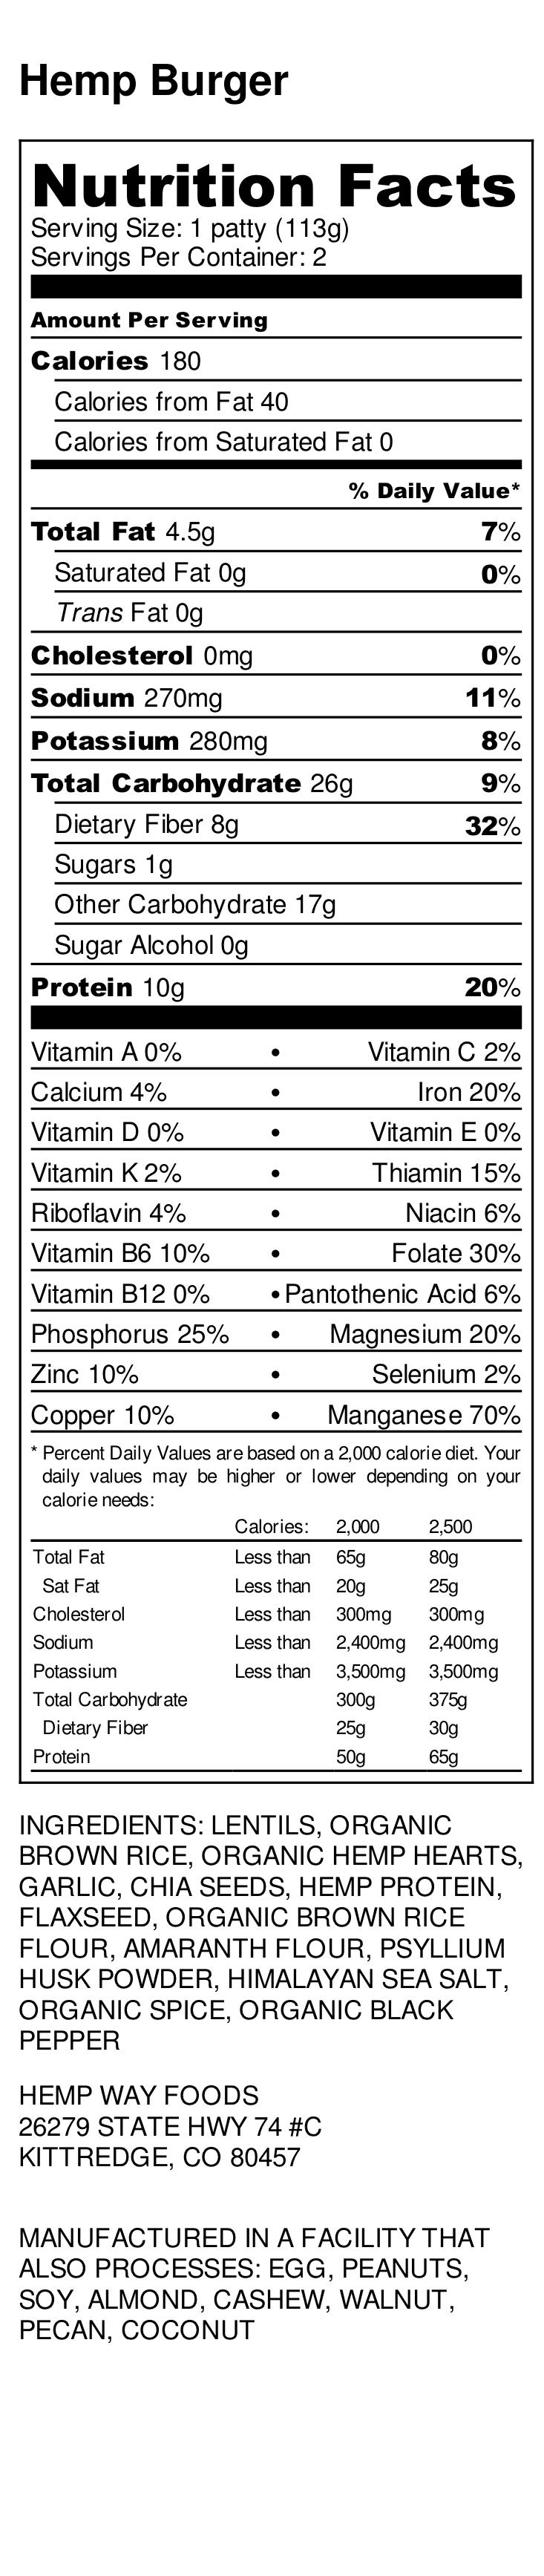 Hemp Burger - Nutrition Label (1).png